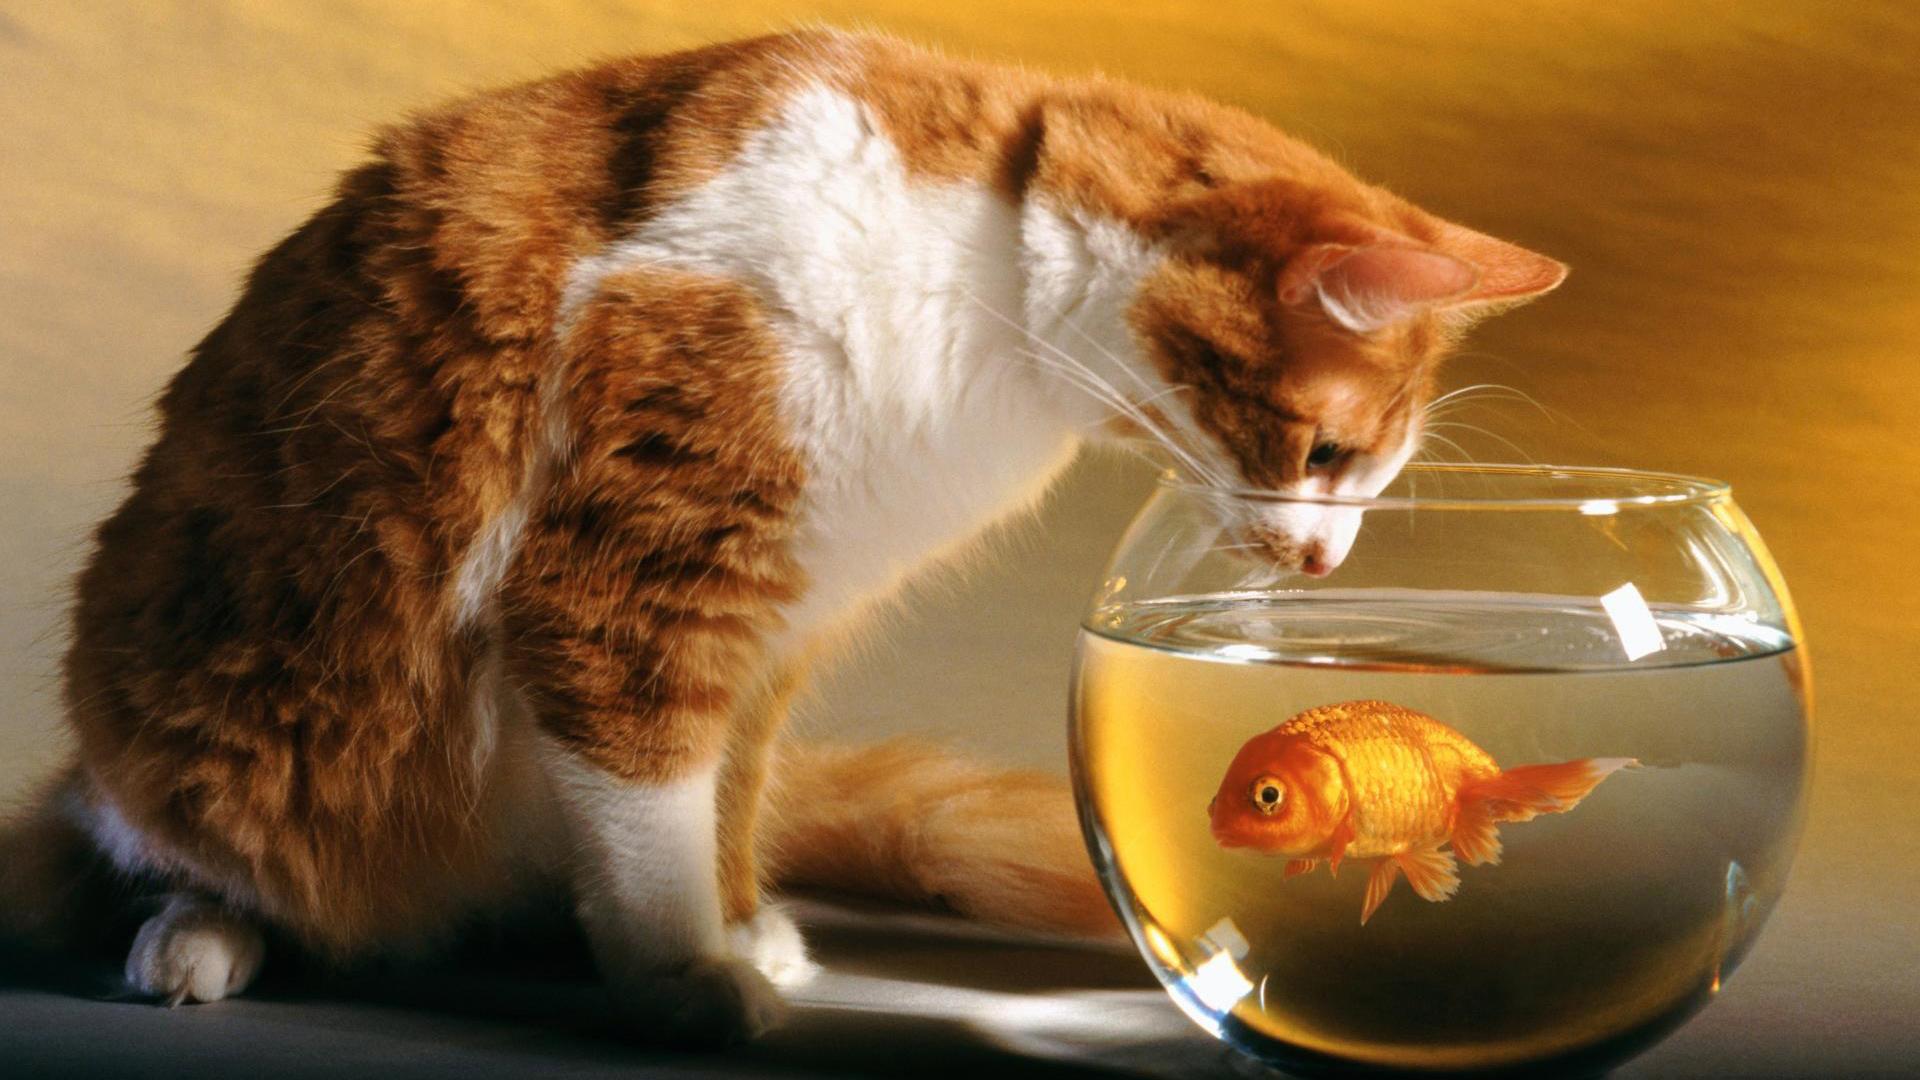 Hd cat wallpaper 621354 for Fish cat 4